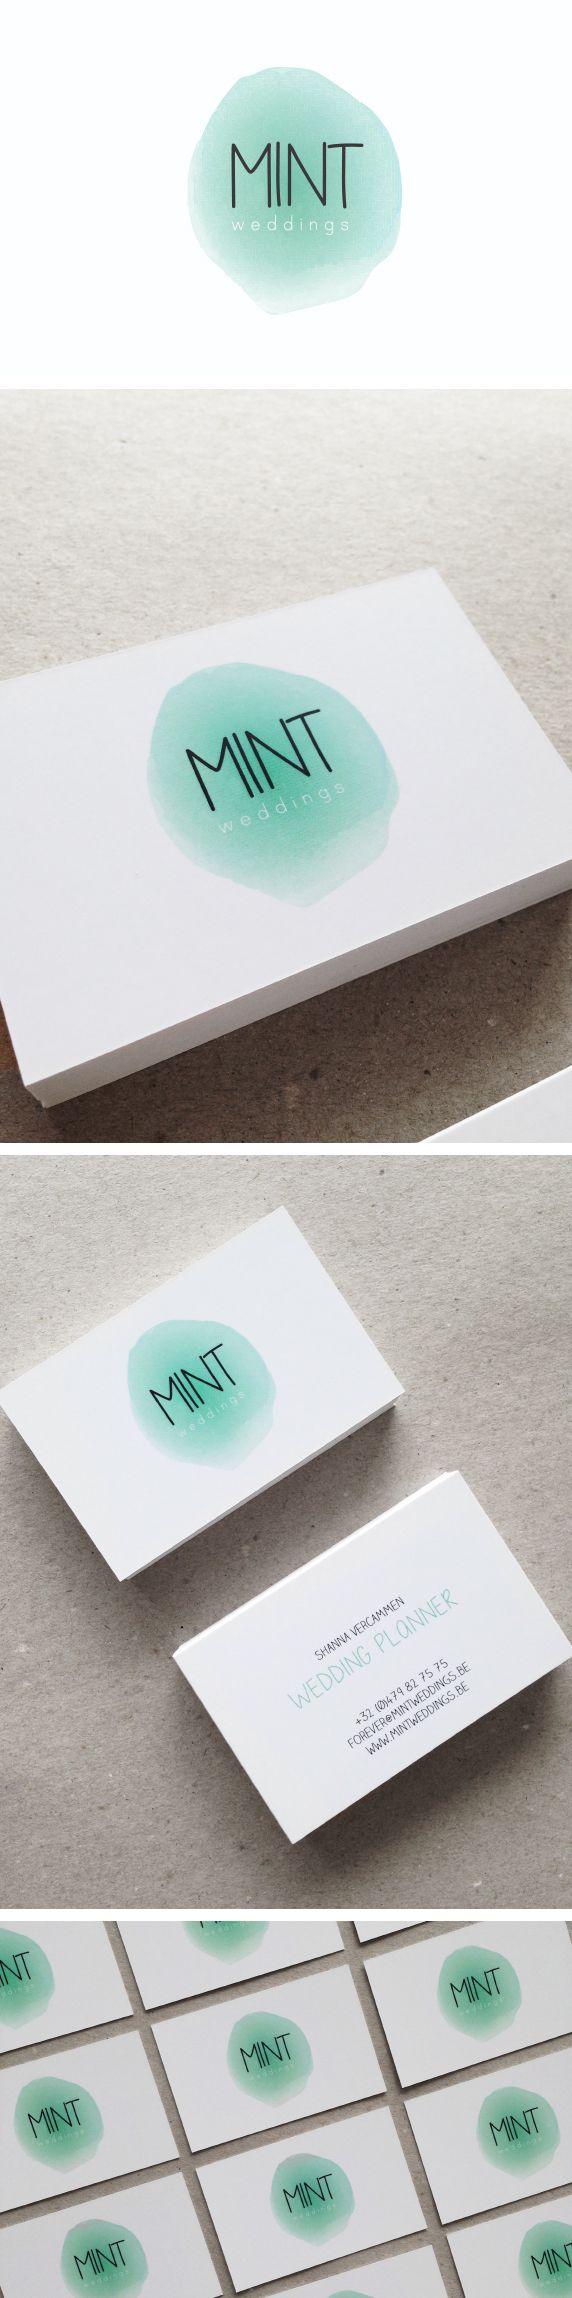 Logo mint weddings. Mint green, aquarelle look, water-colour, wedding planner, naamkaartjes mintgroen, design, trouw